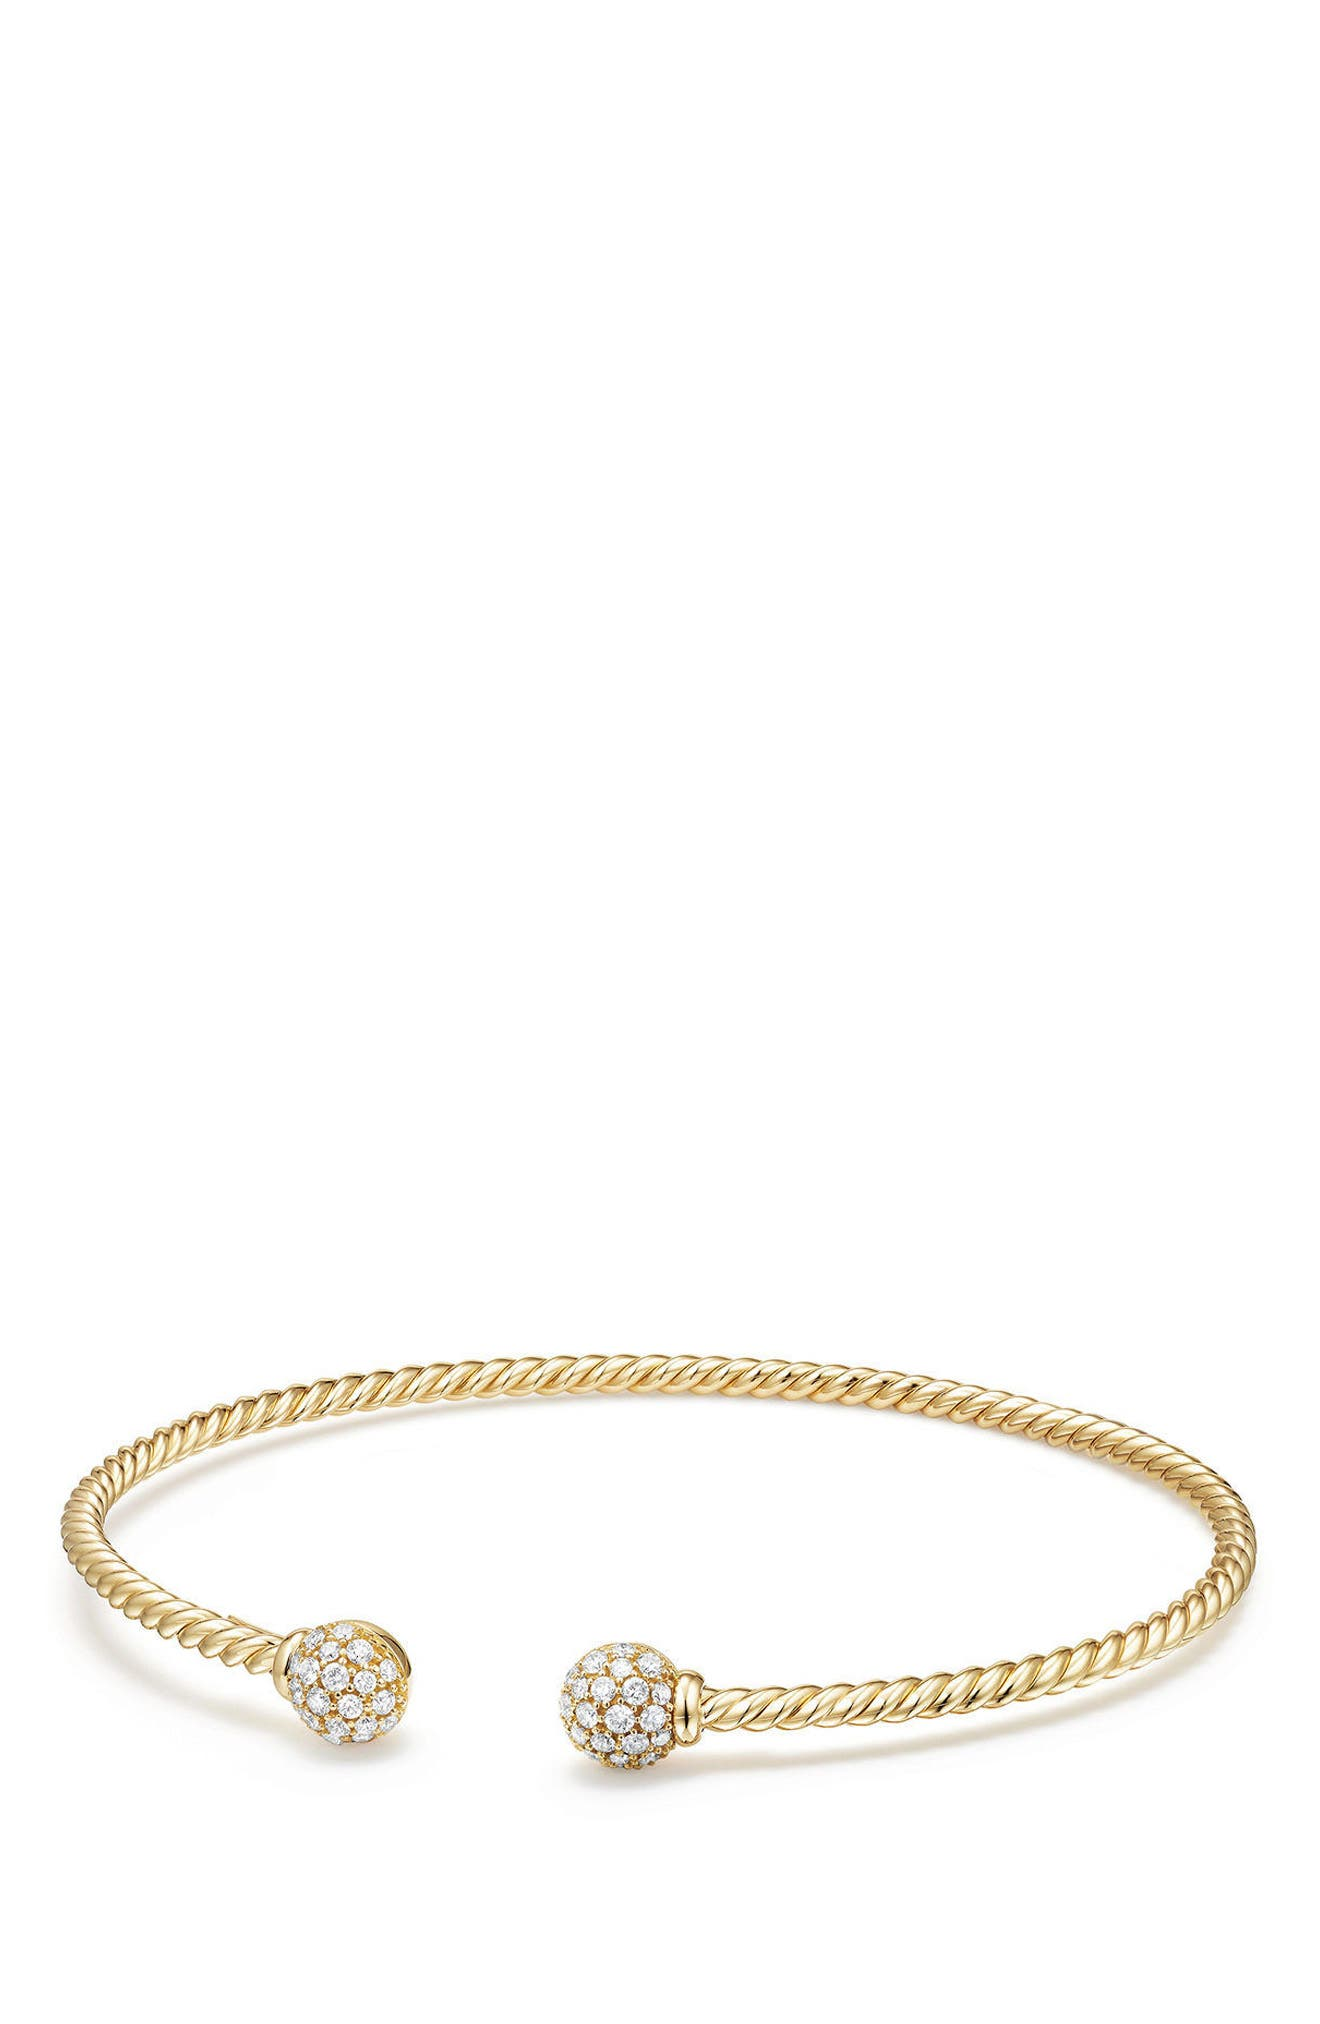 Solari Bead Bracelet with Diamonds in 18K Gold,                         Main,                         color, Yellow Gold/ Diamond